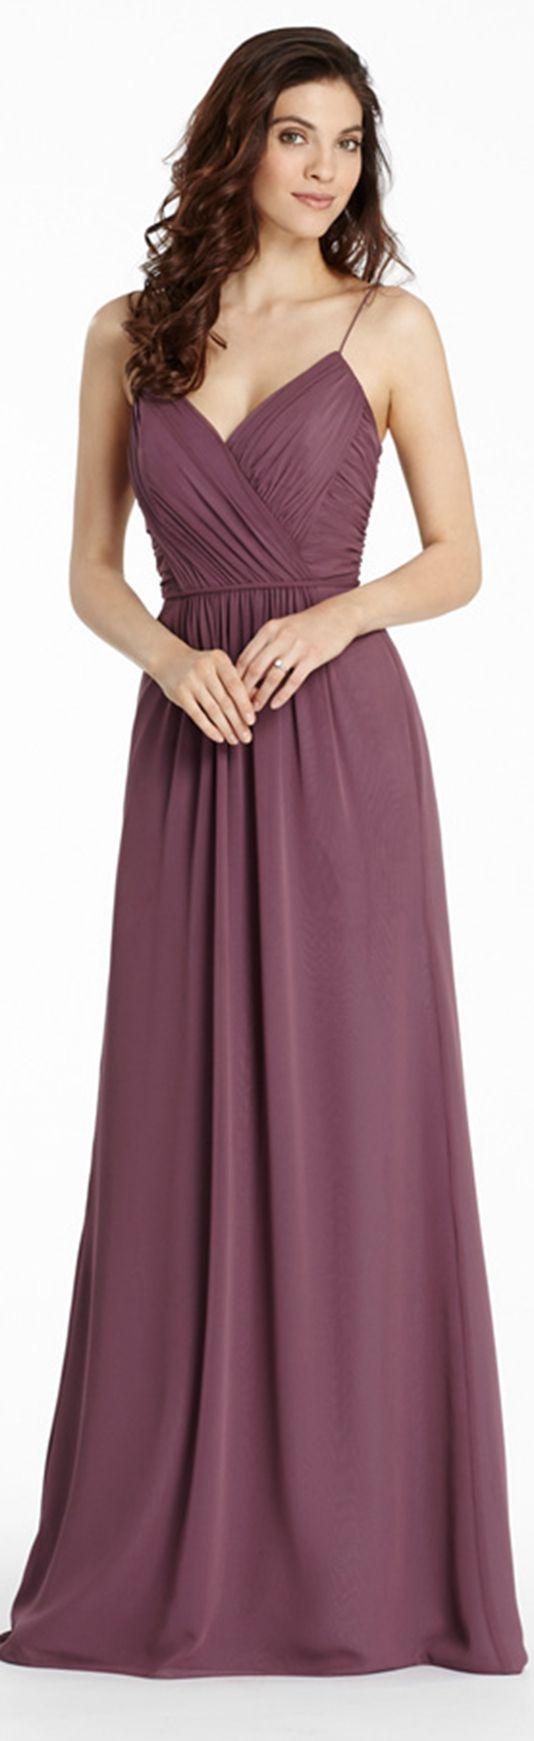 BHLDN\'s Hitherto Fleur Dress in Ivory | Dark purple, Dark and Wedding